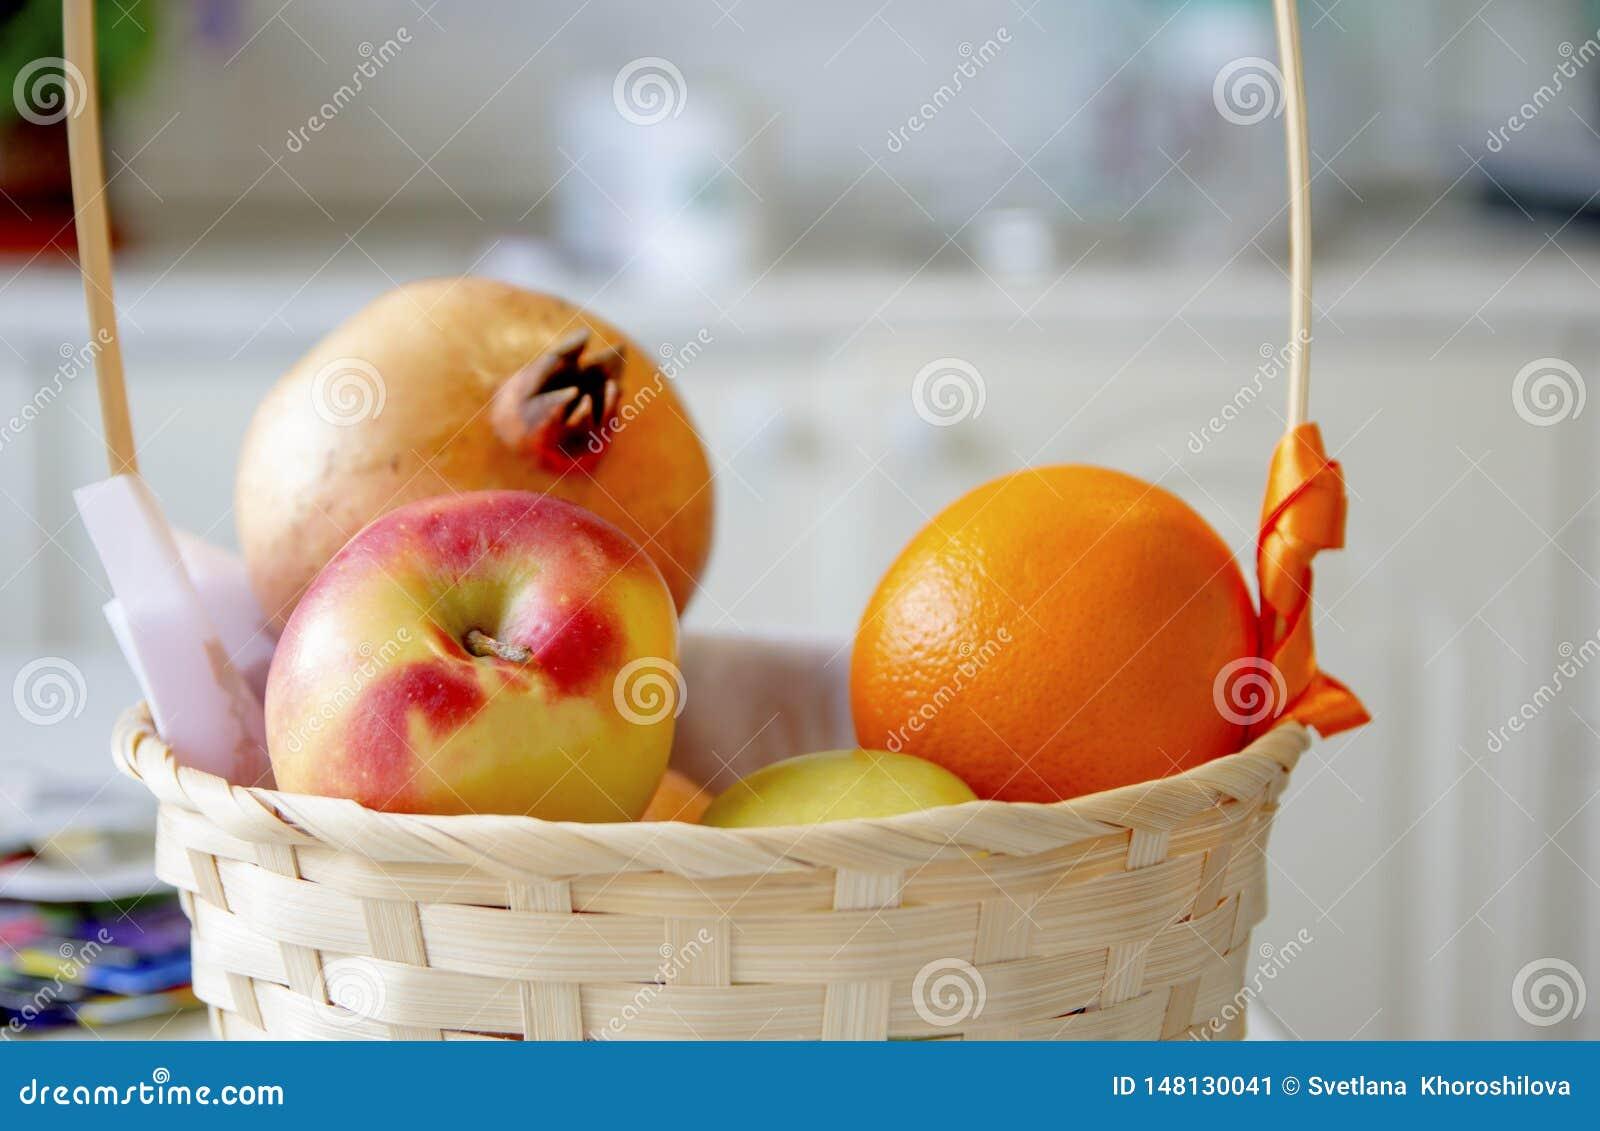 Fruits lie in a wicker basket in the bright kitchen